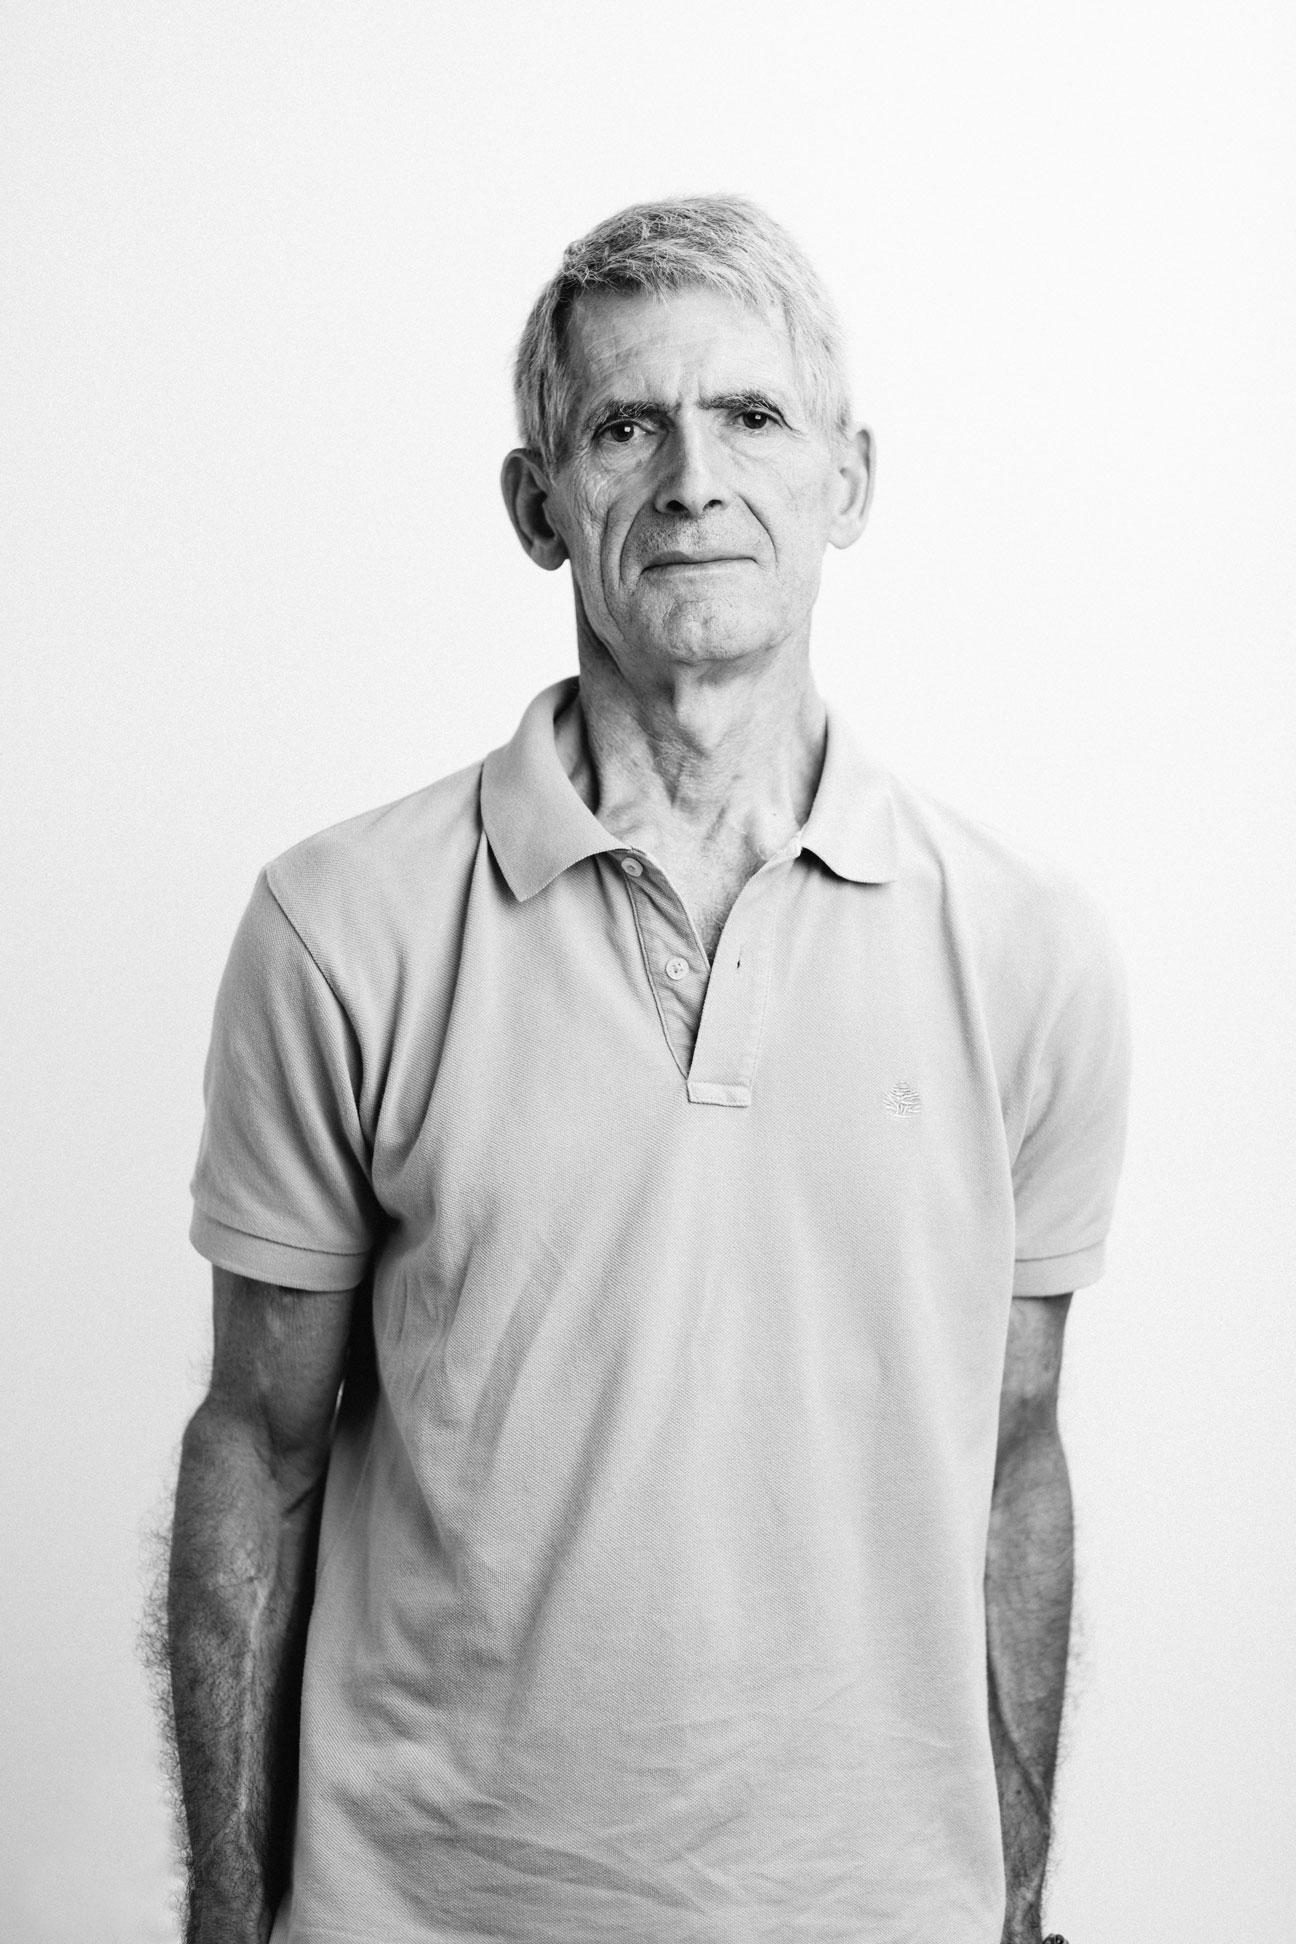 fotografo de retrato estudio valencia